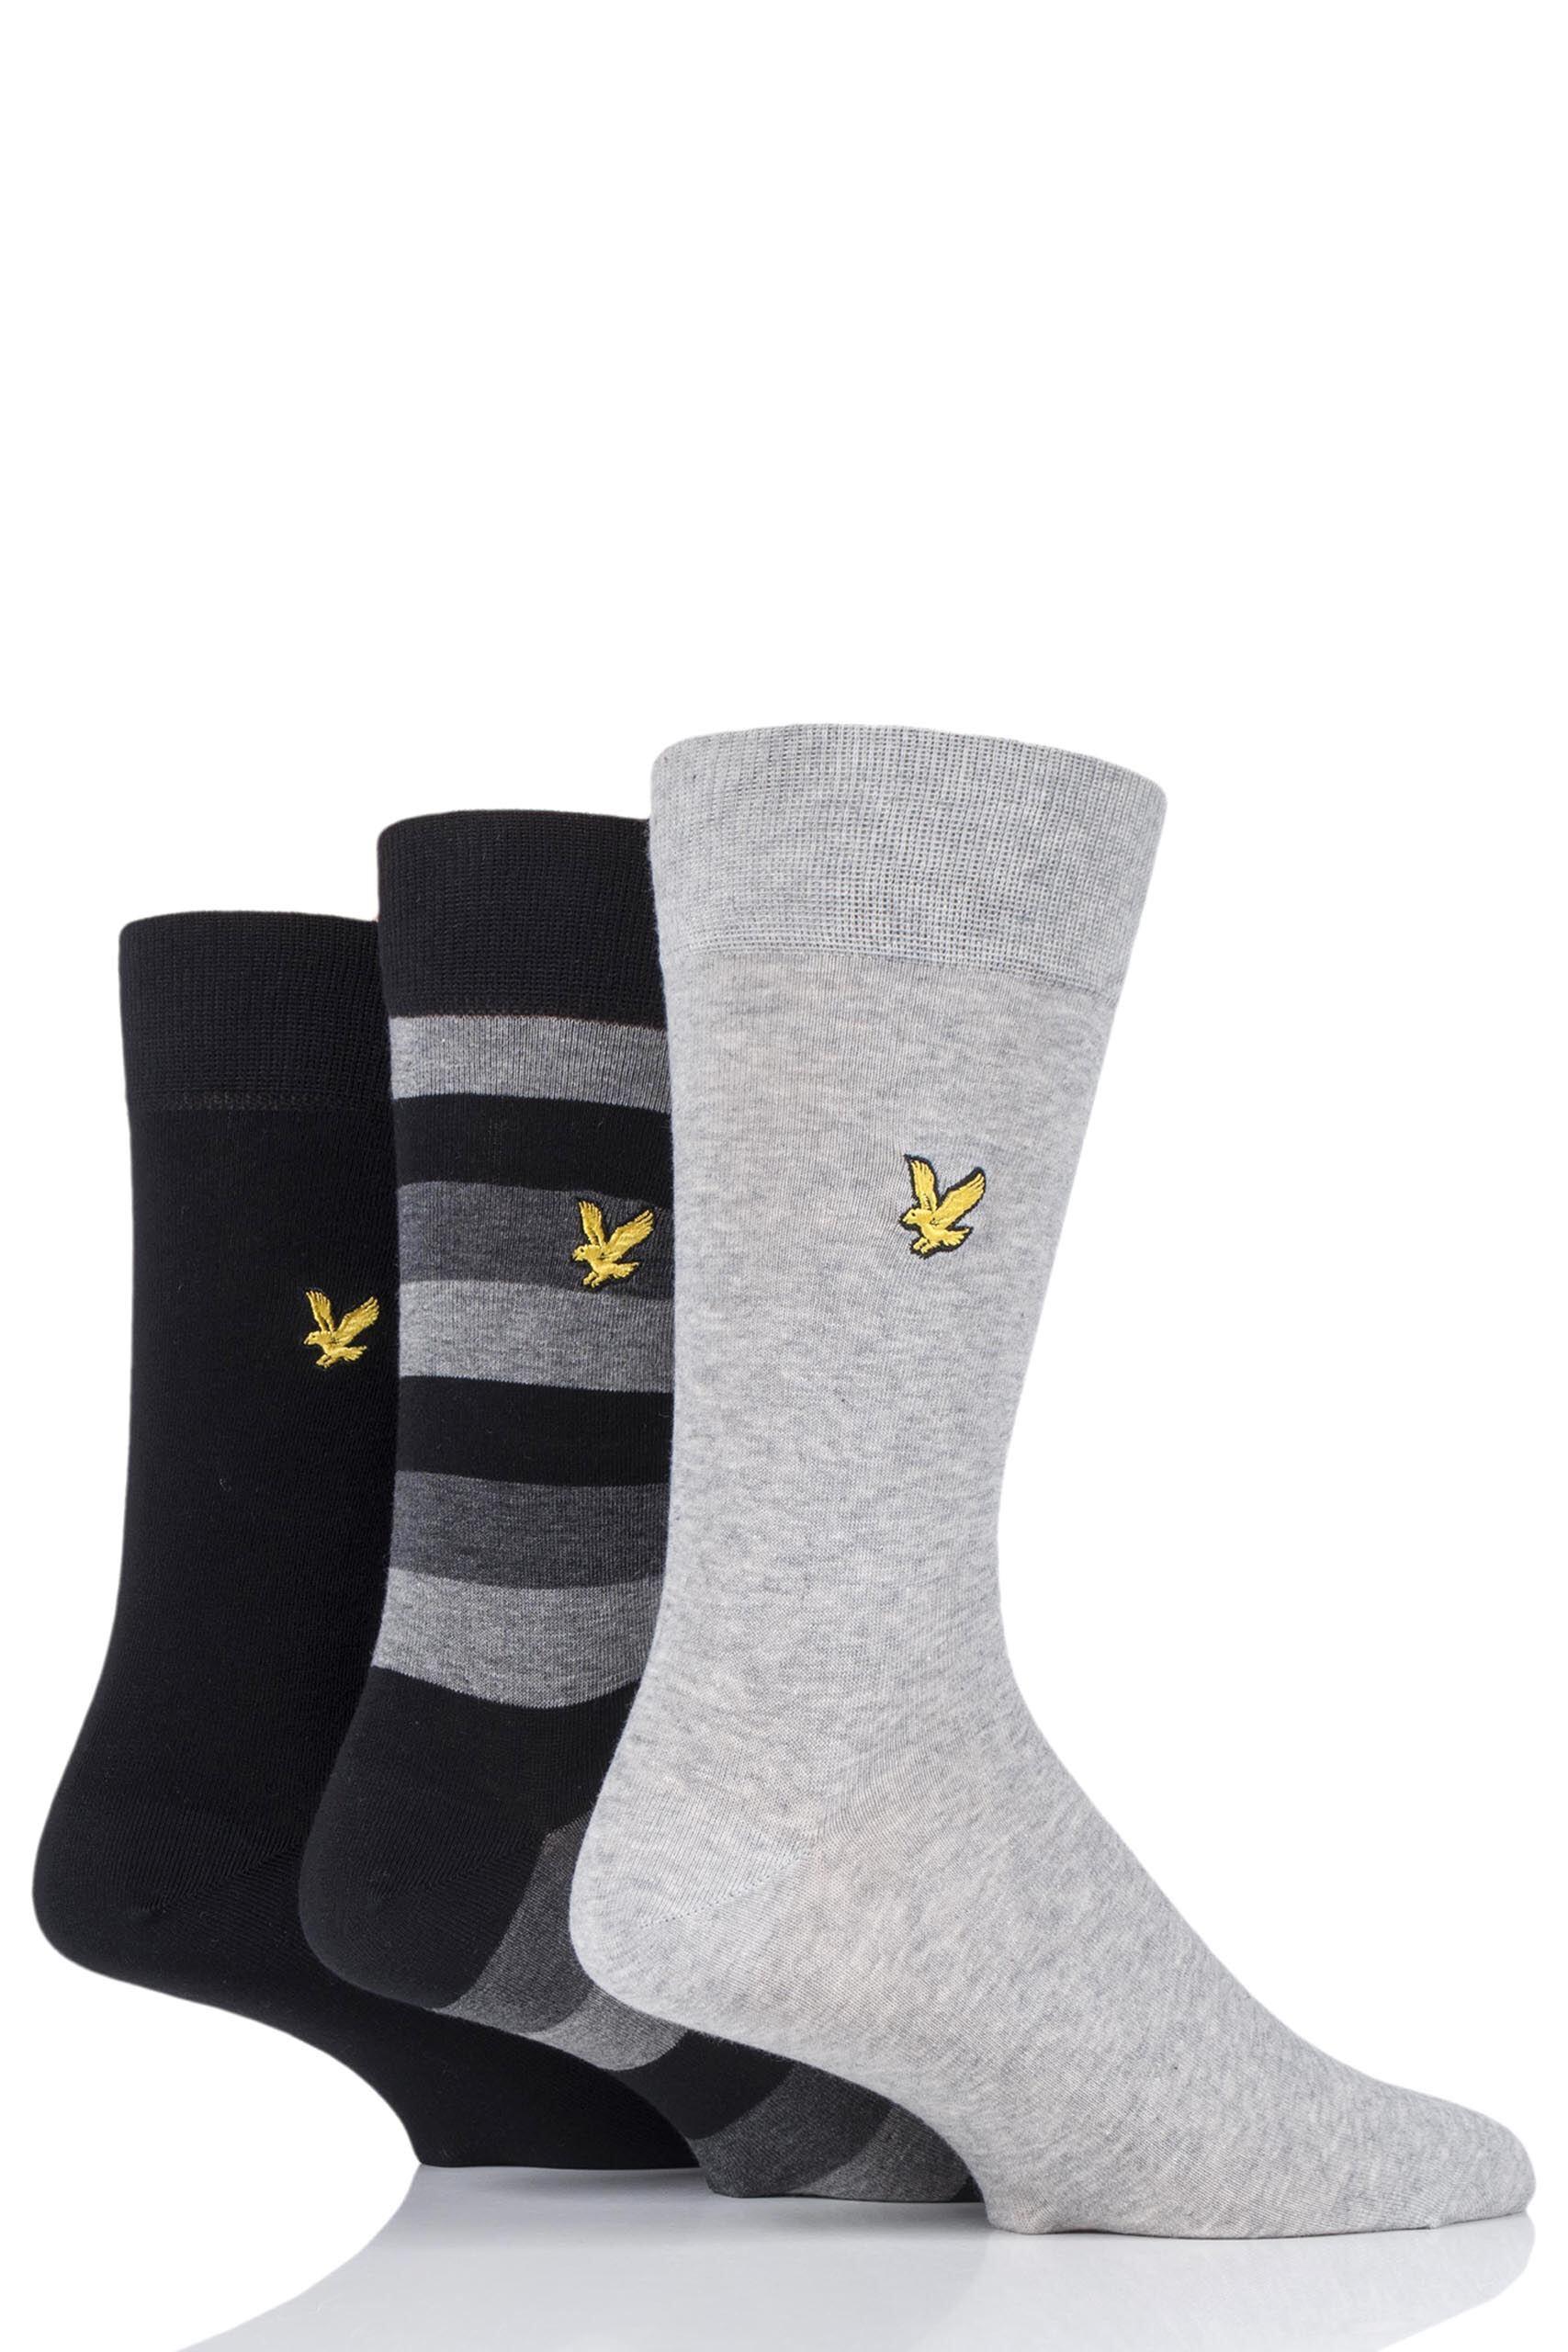 Image of 3 Pair Black Scotty Striped Cotton Socks Men's 7-11 Mens - Lyle & Scott